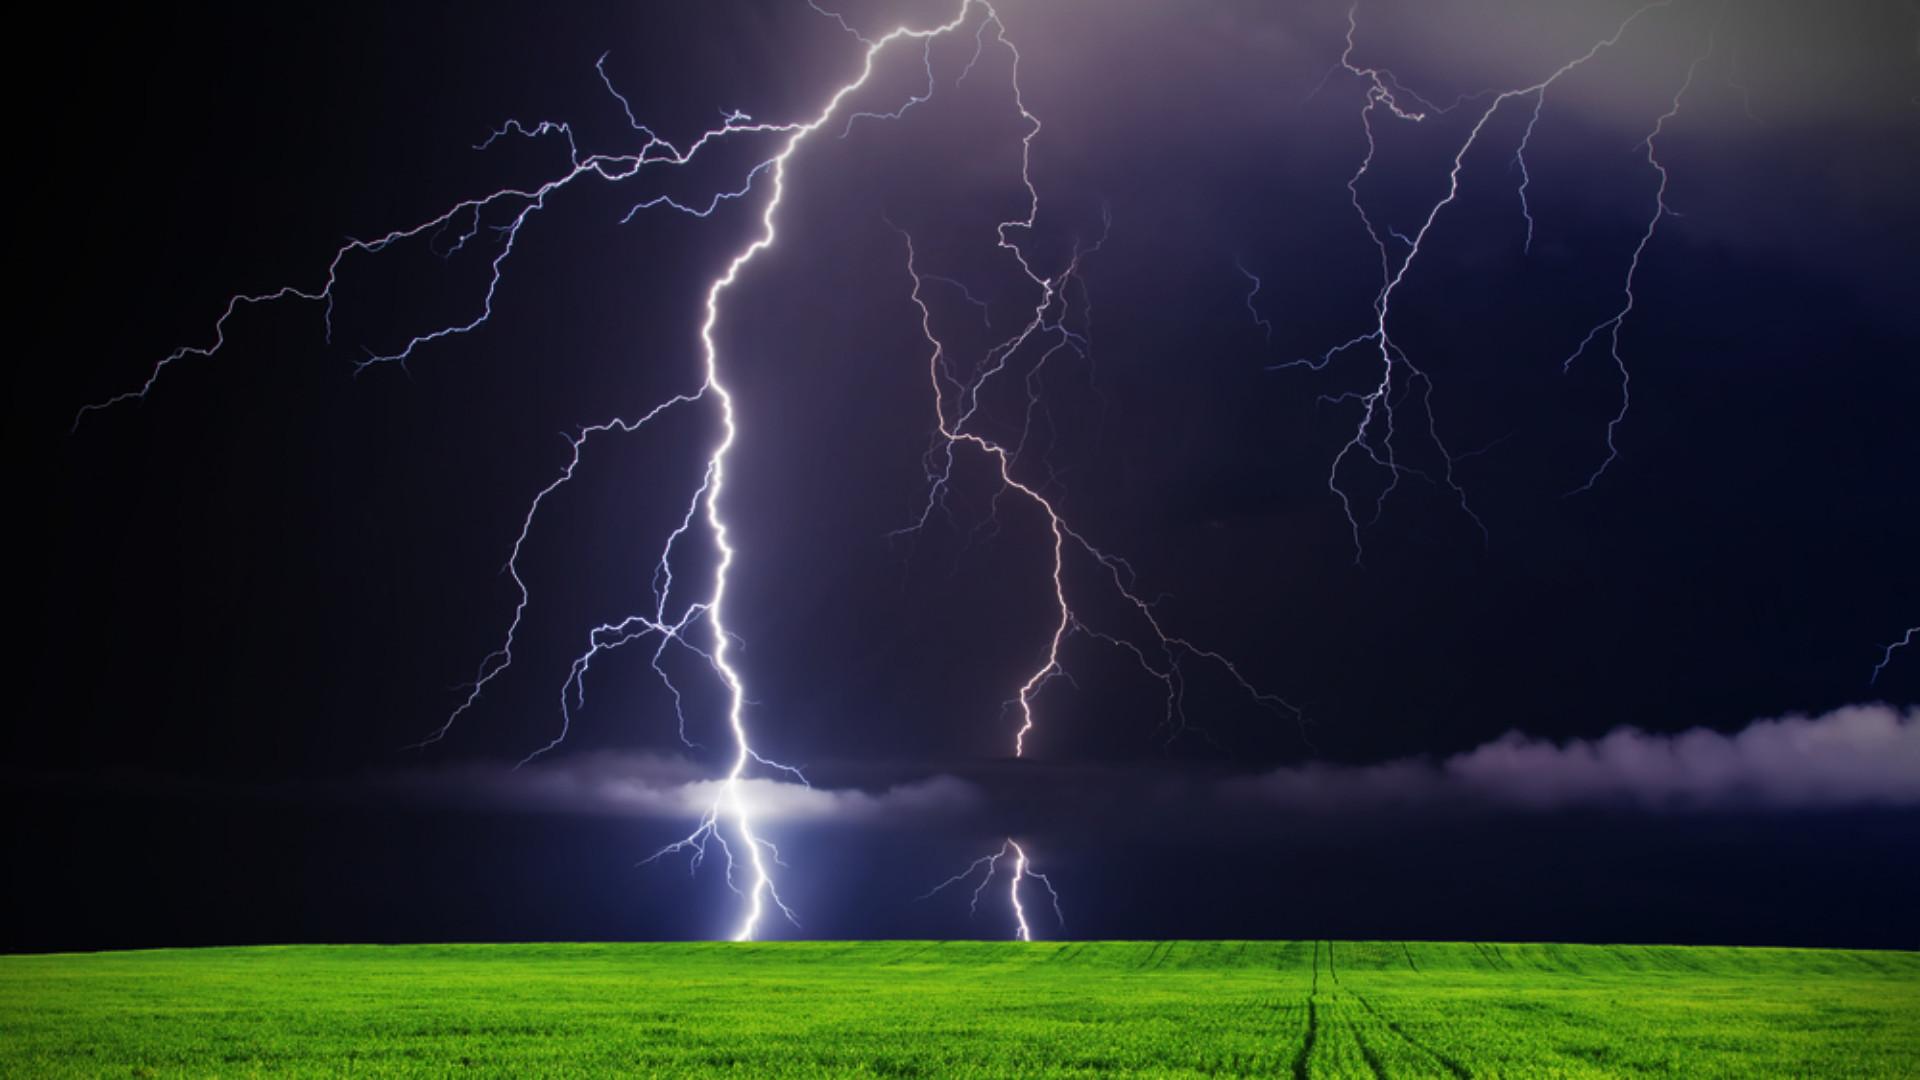 Res: 1920x1080, Lightning Storm Hd Wallpaper